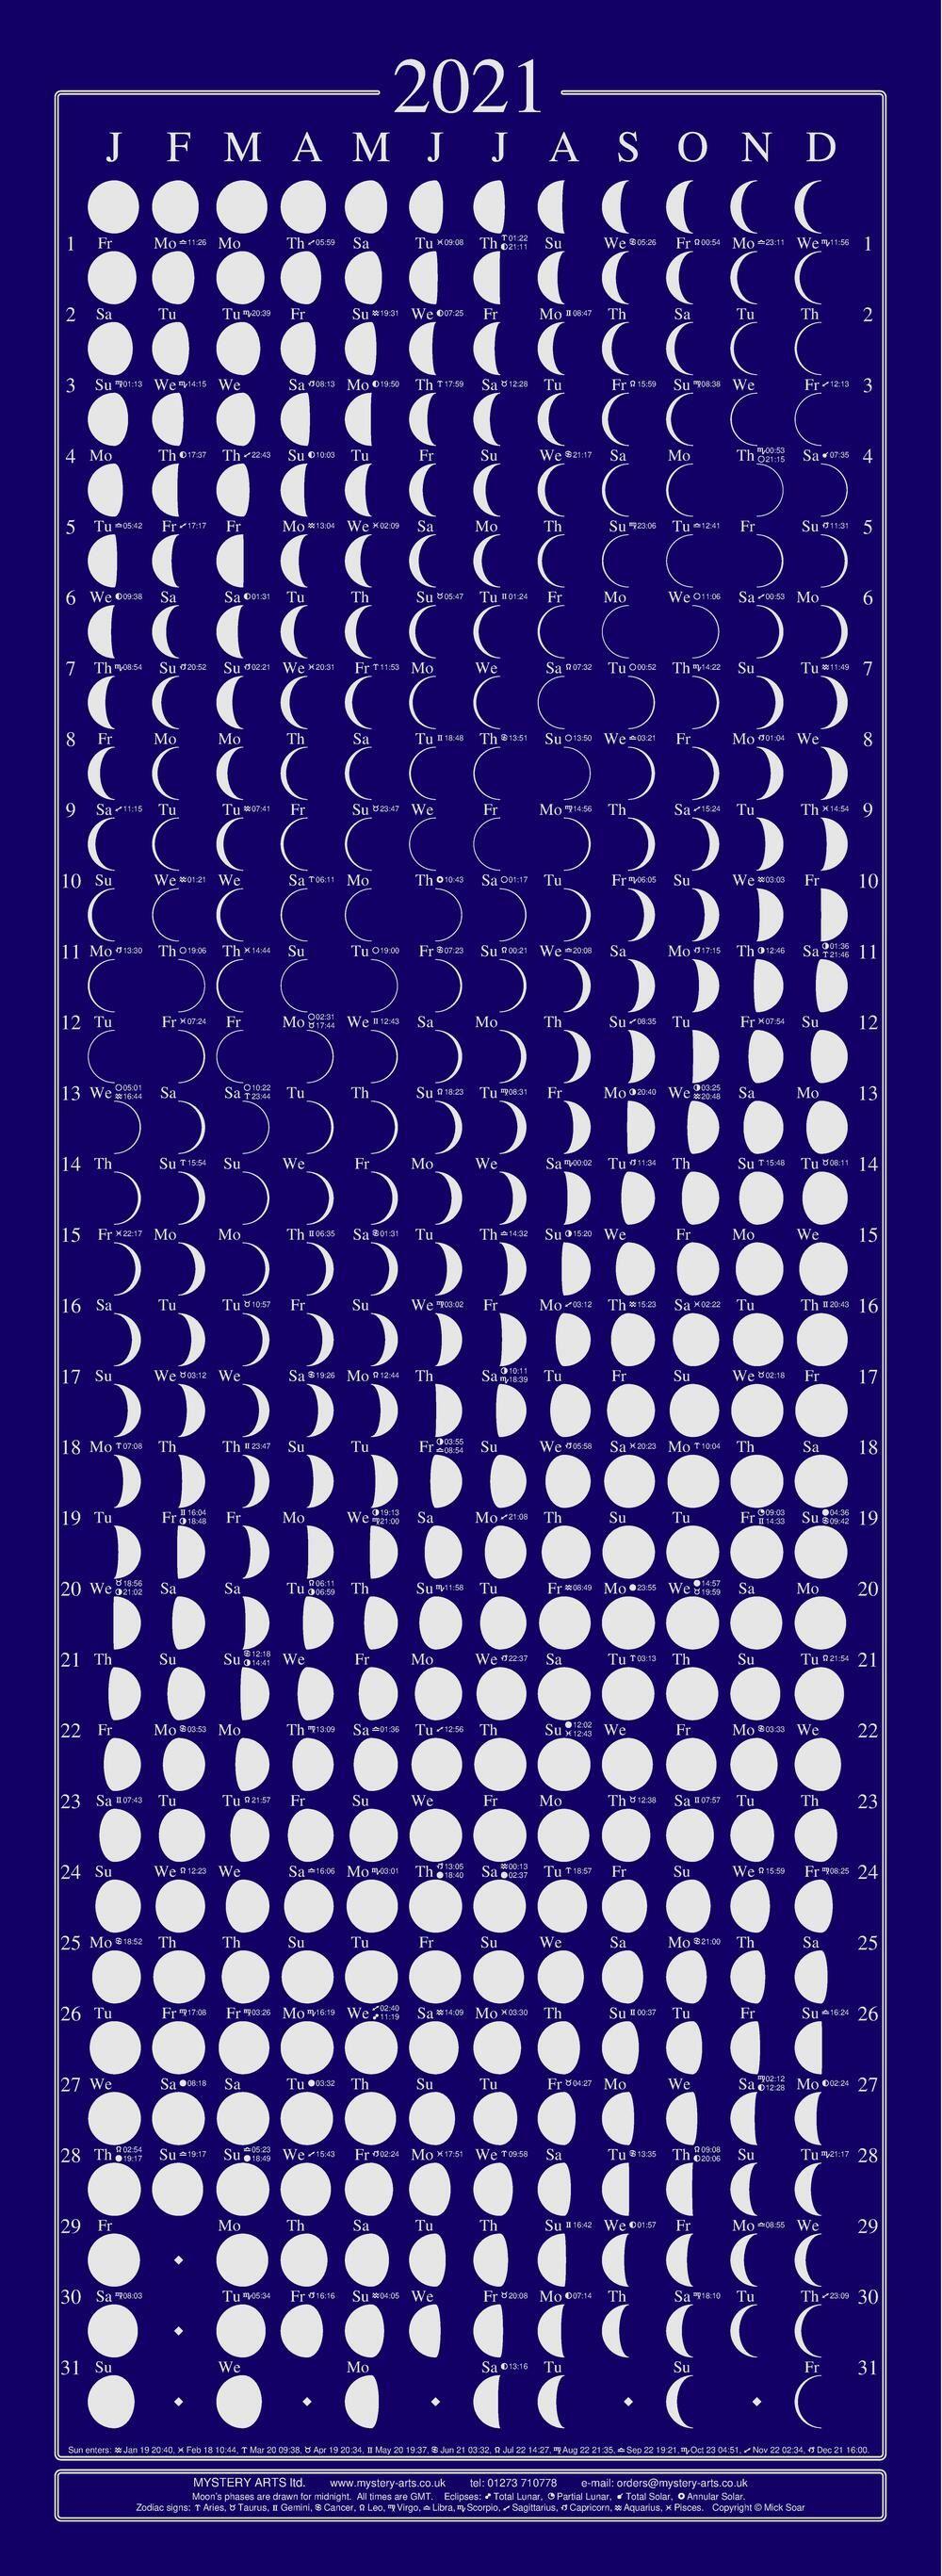 Moon Calendar Poster 2021